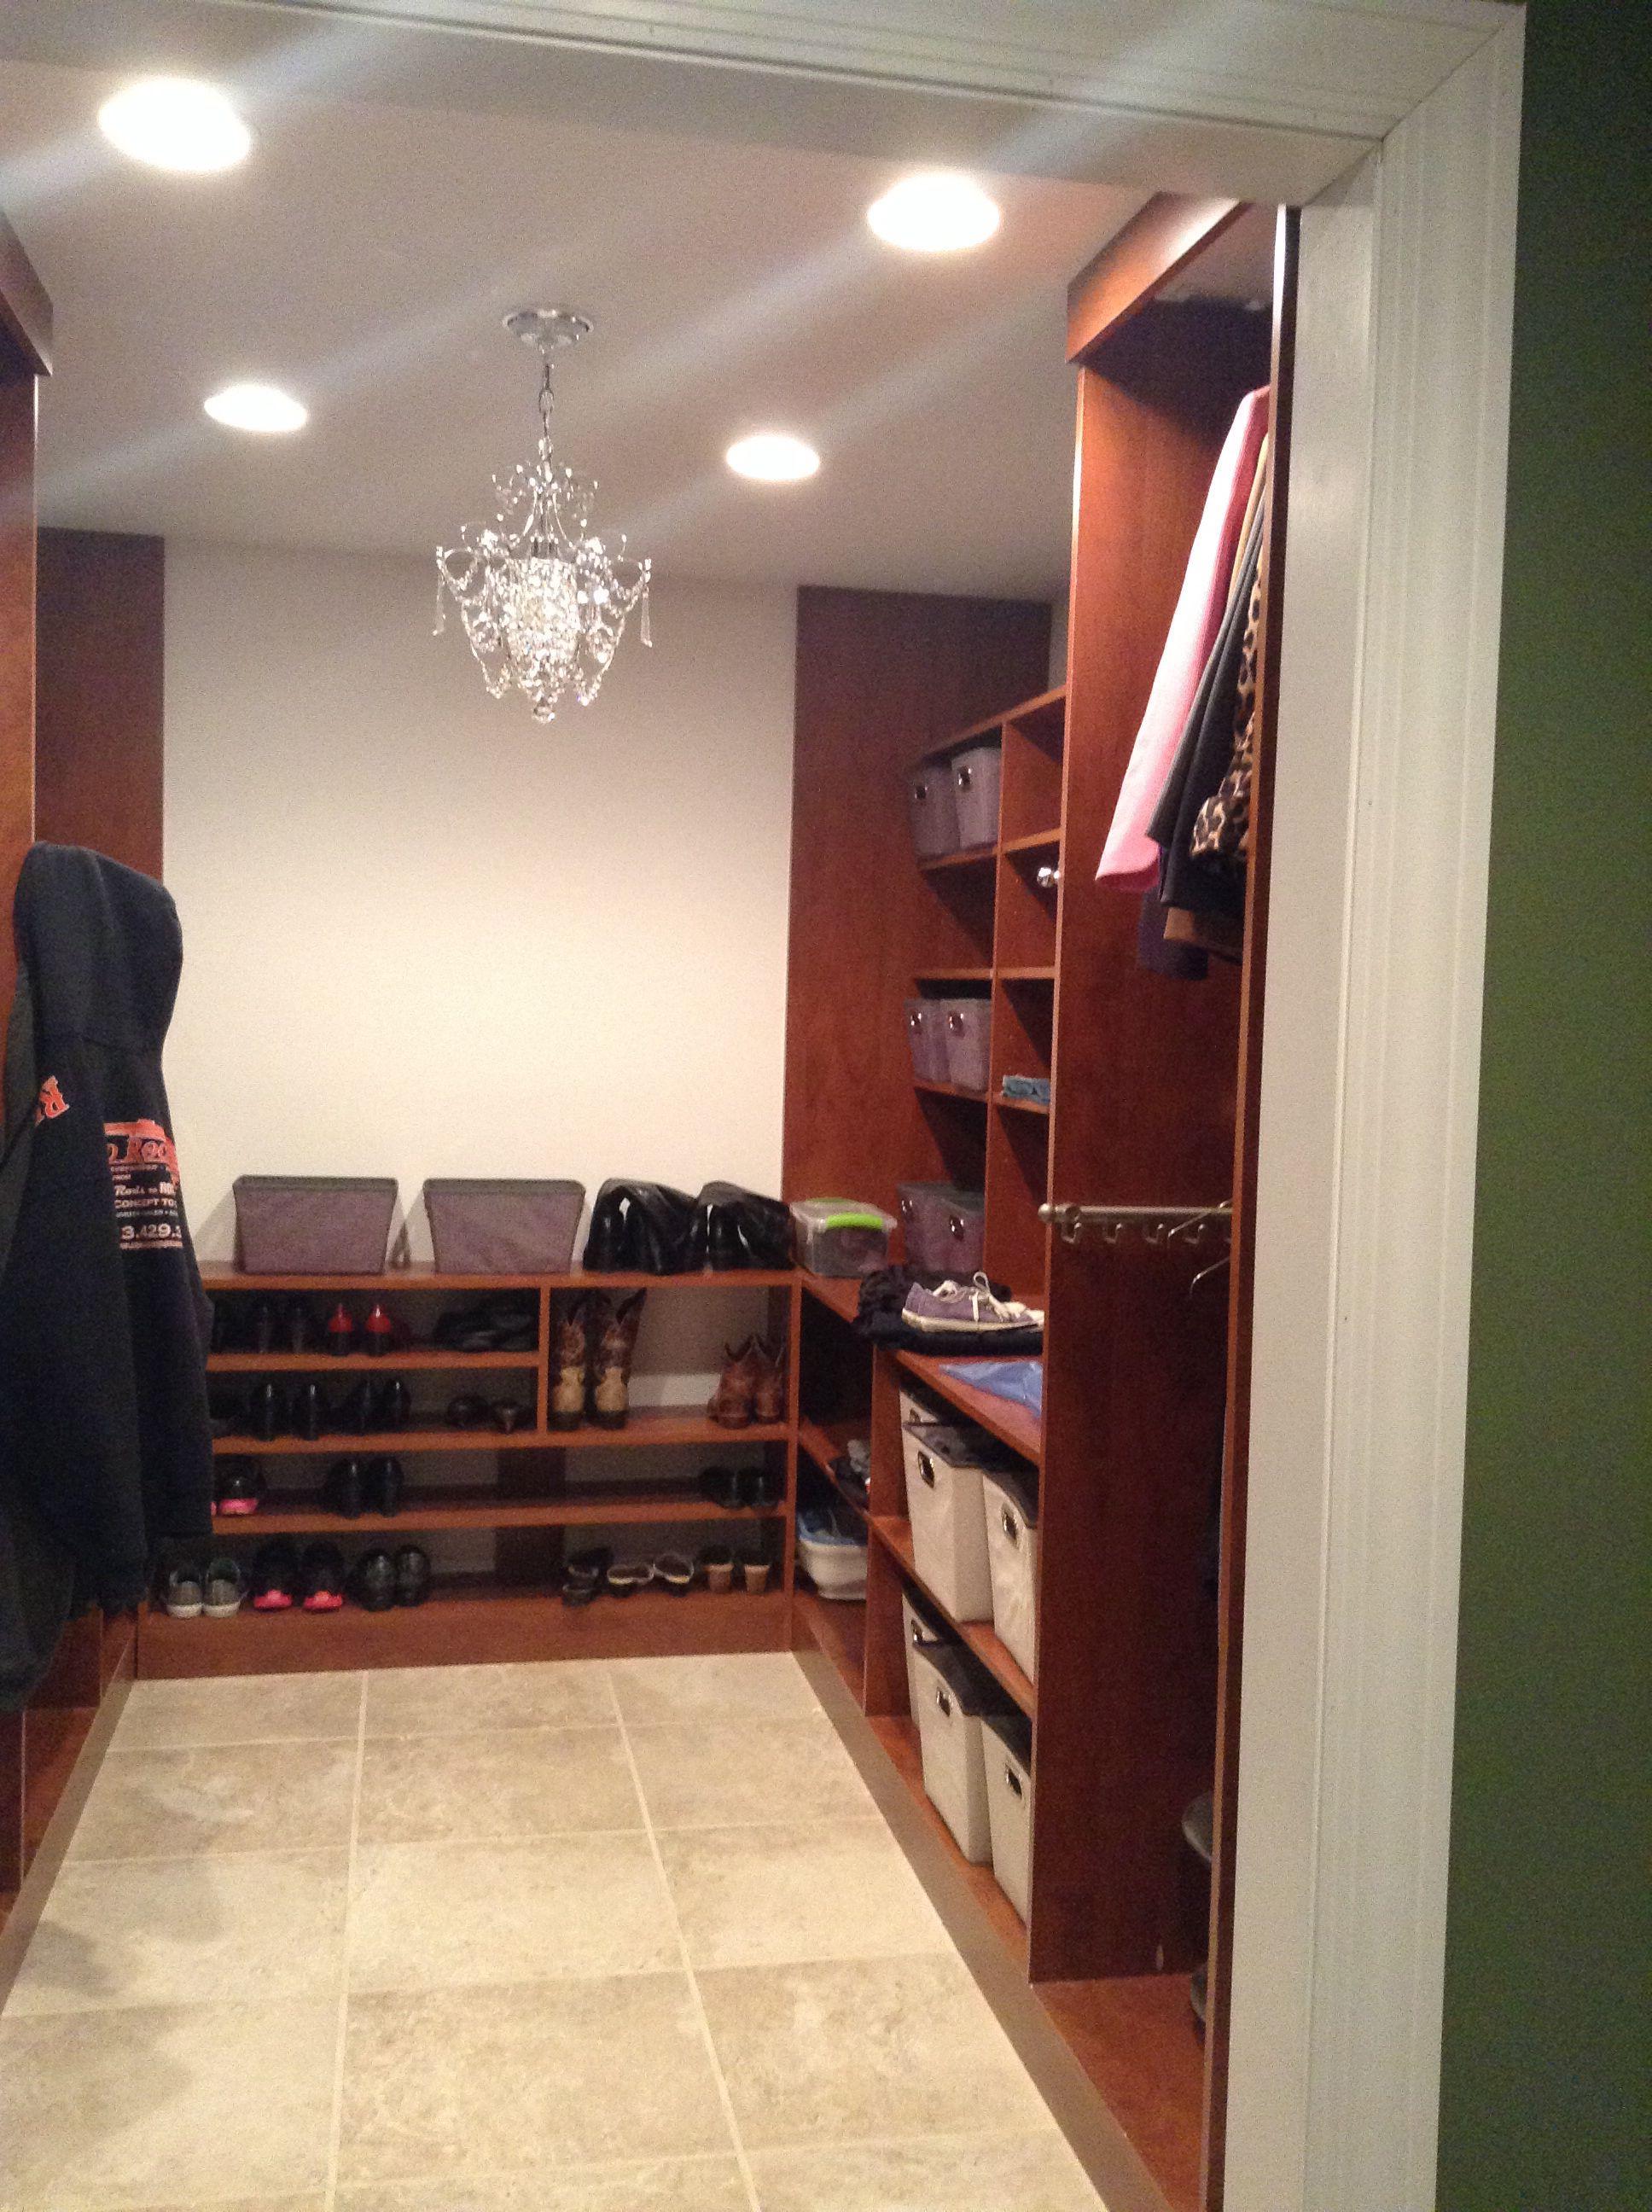 Walk in closet ~ very nice!